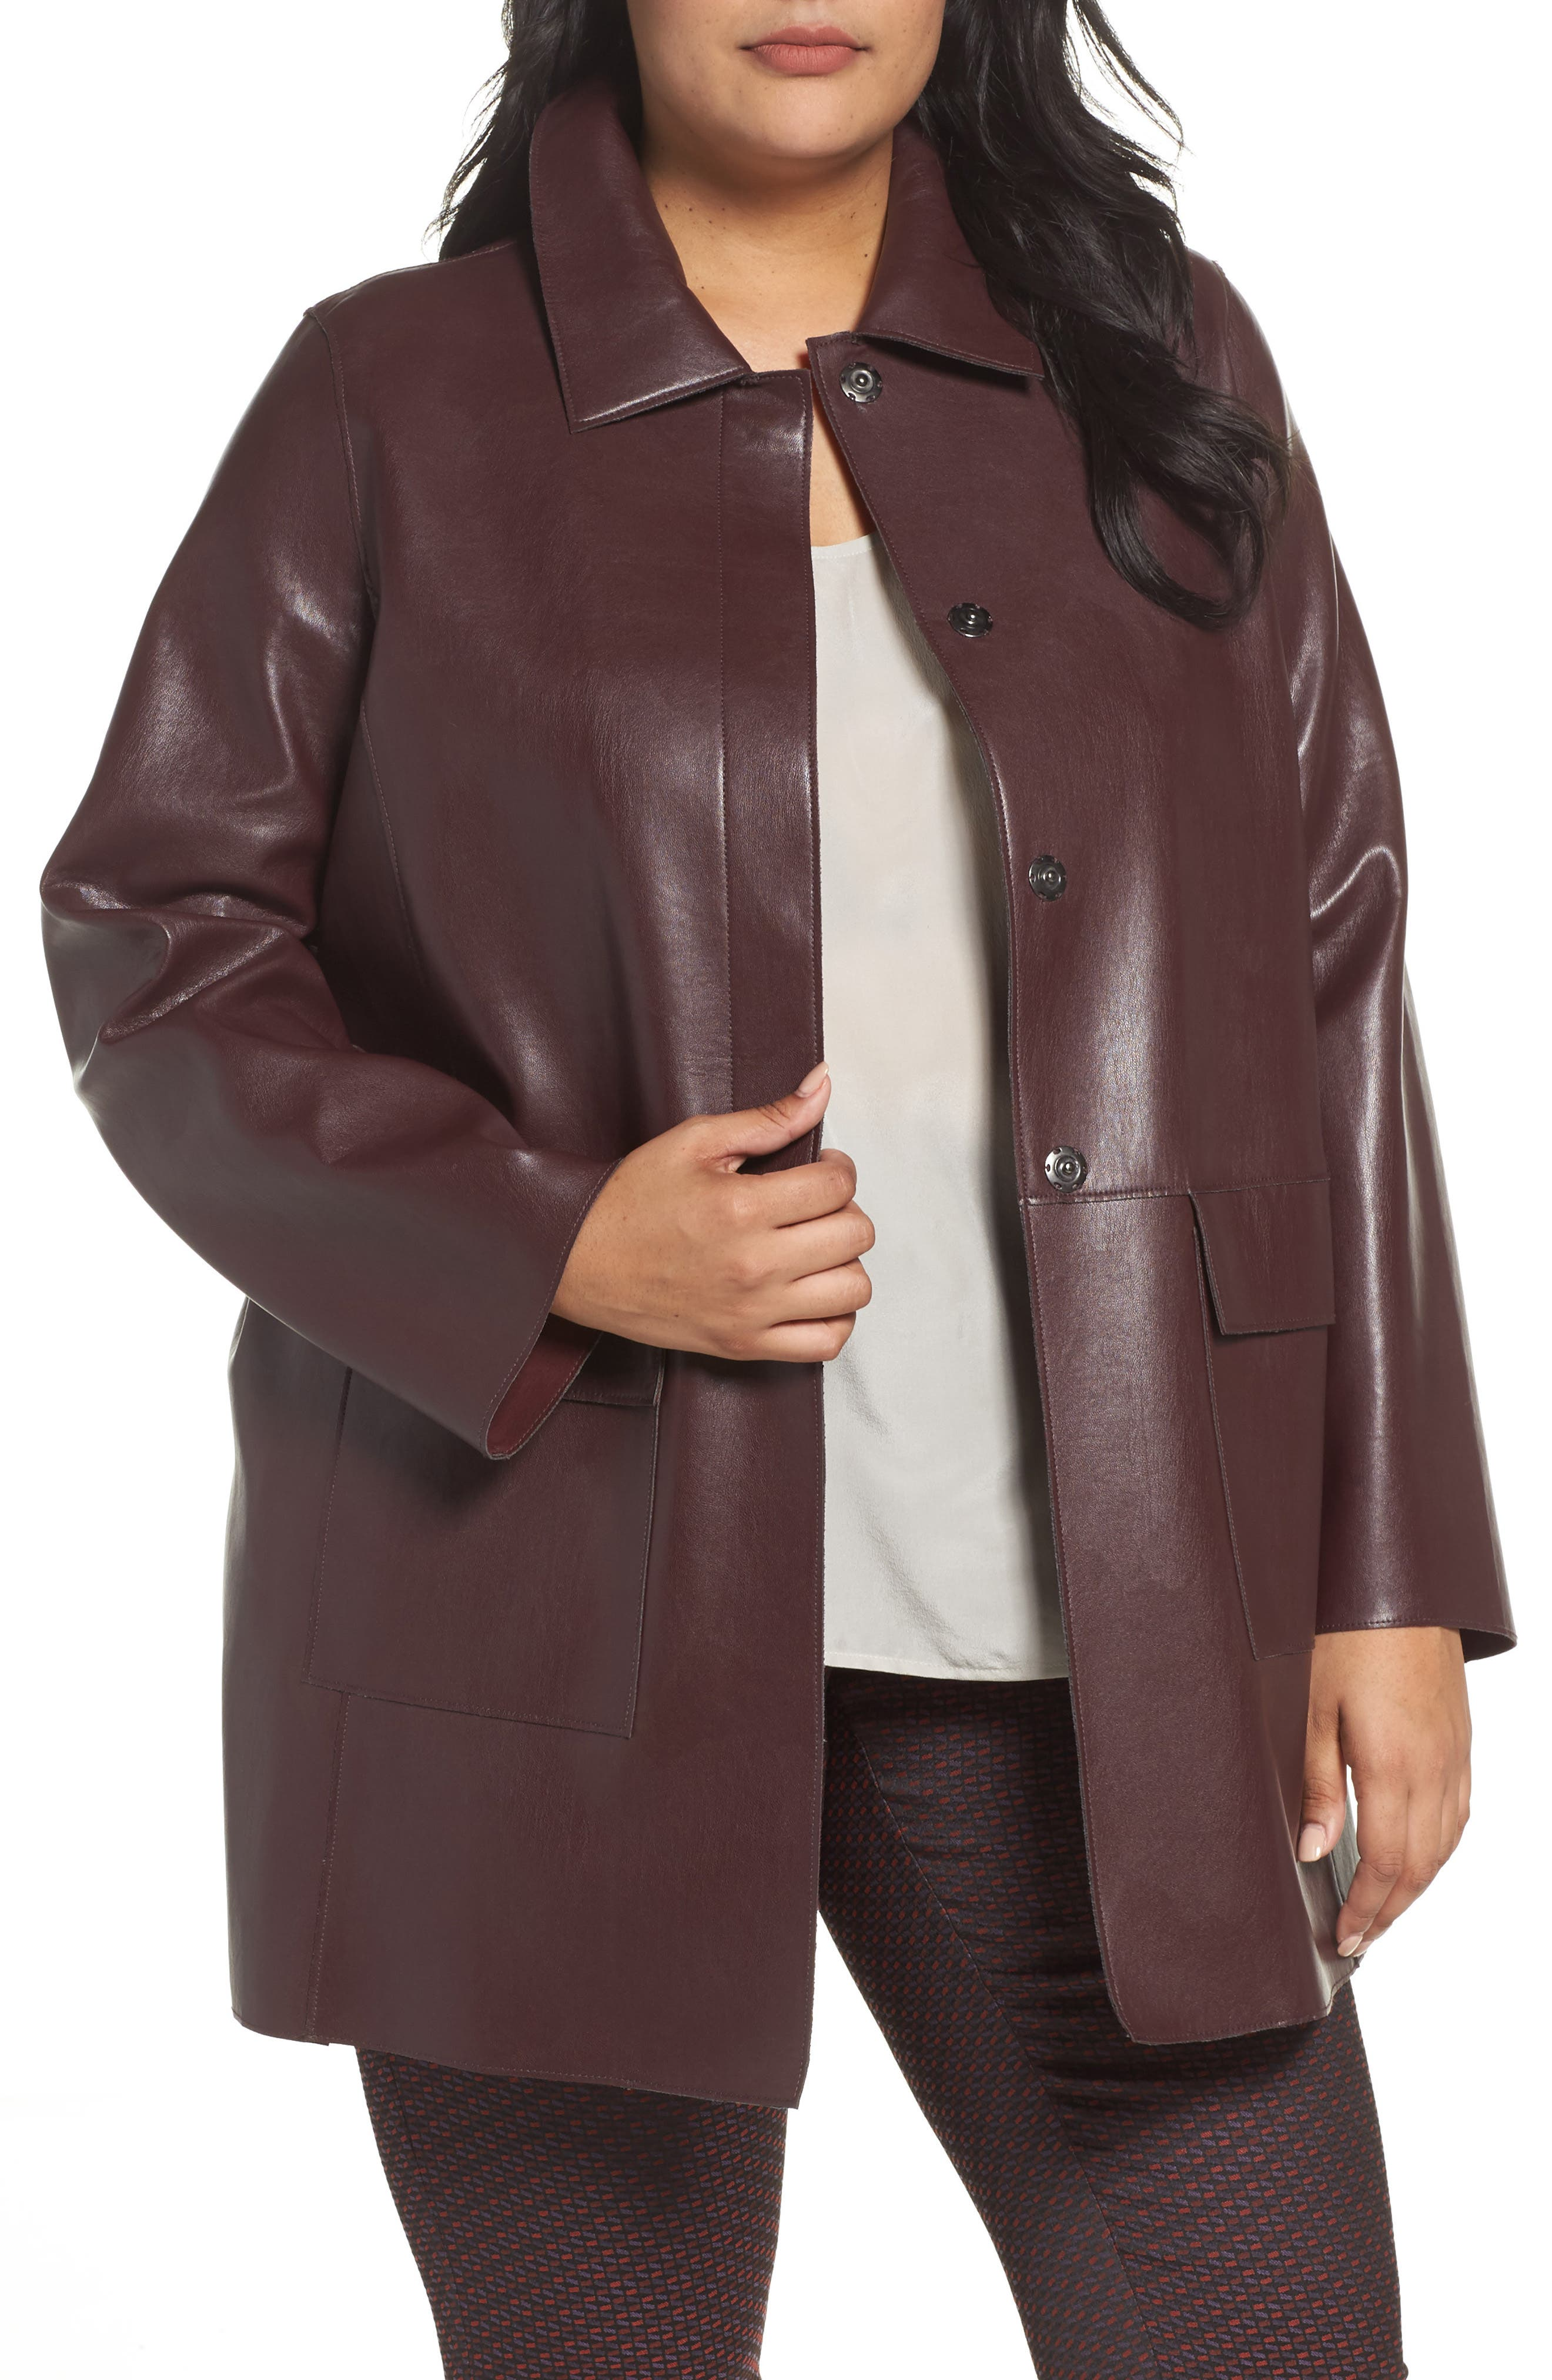 Alternate Image 1 Selected - Persona by Marina Rinaldi Narrare Faux Leather Coat (Plus Size)